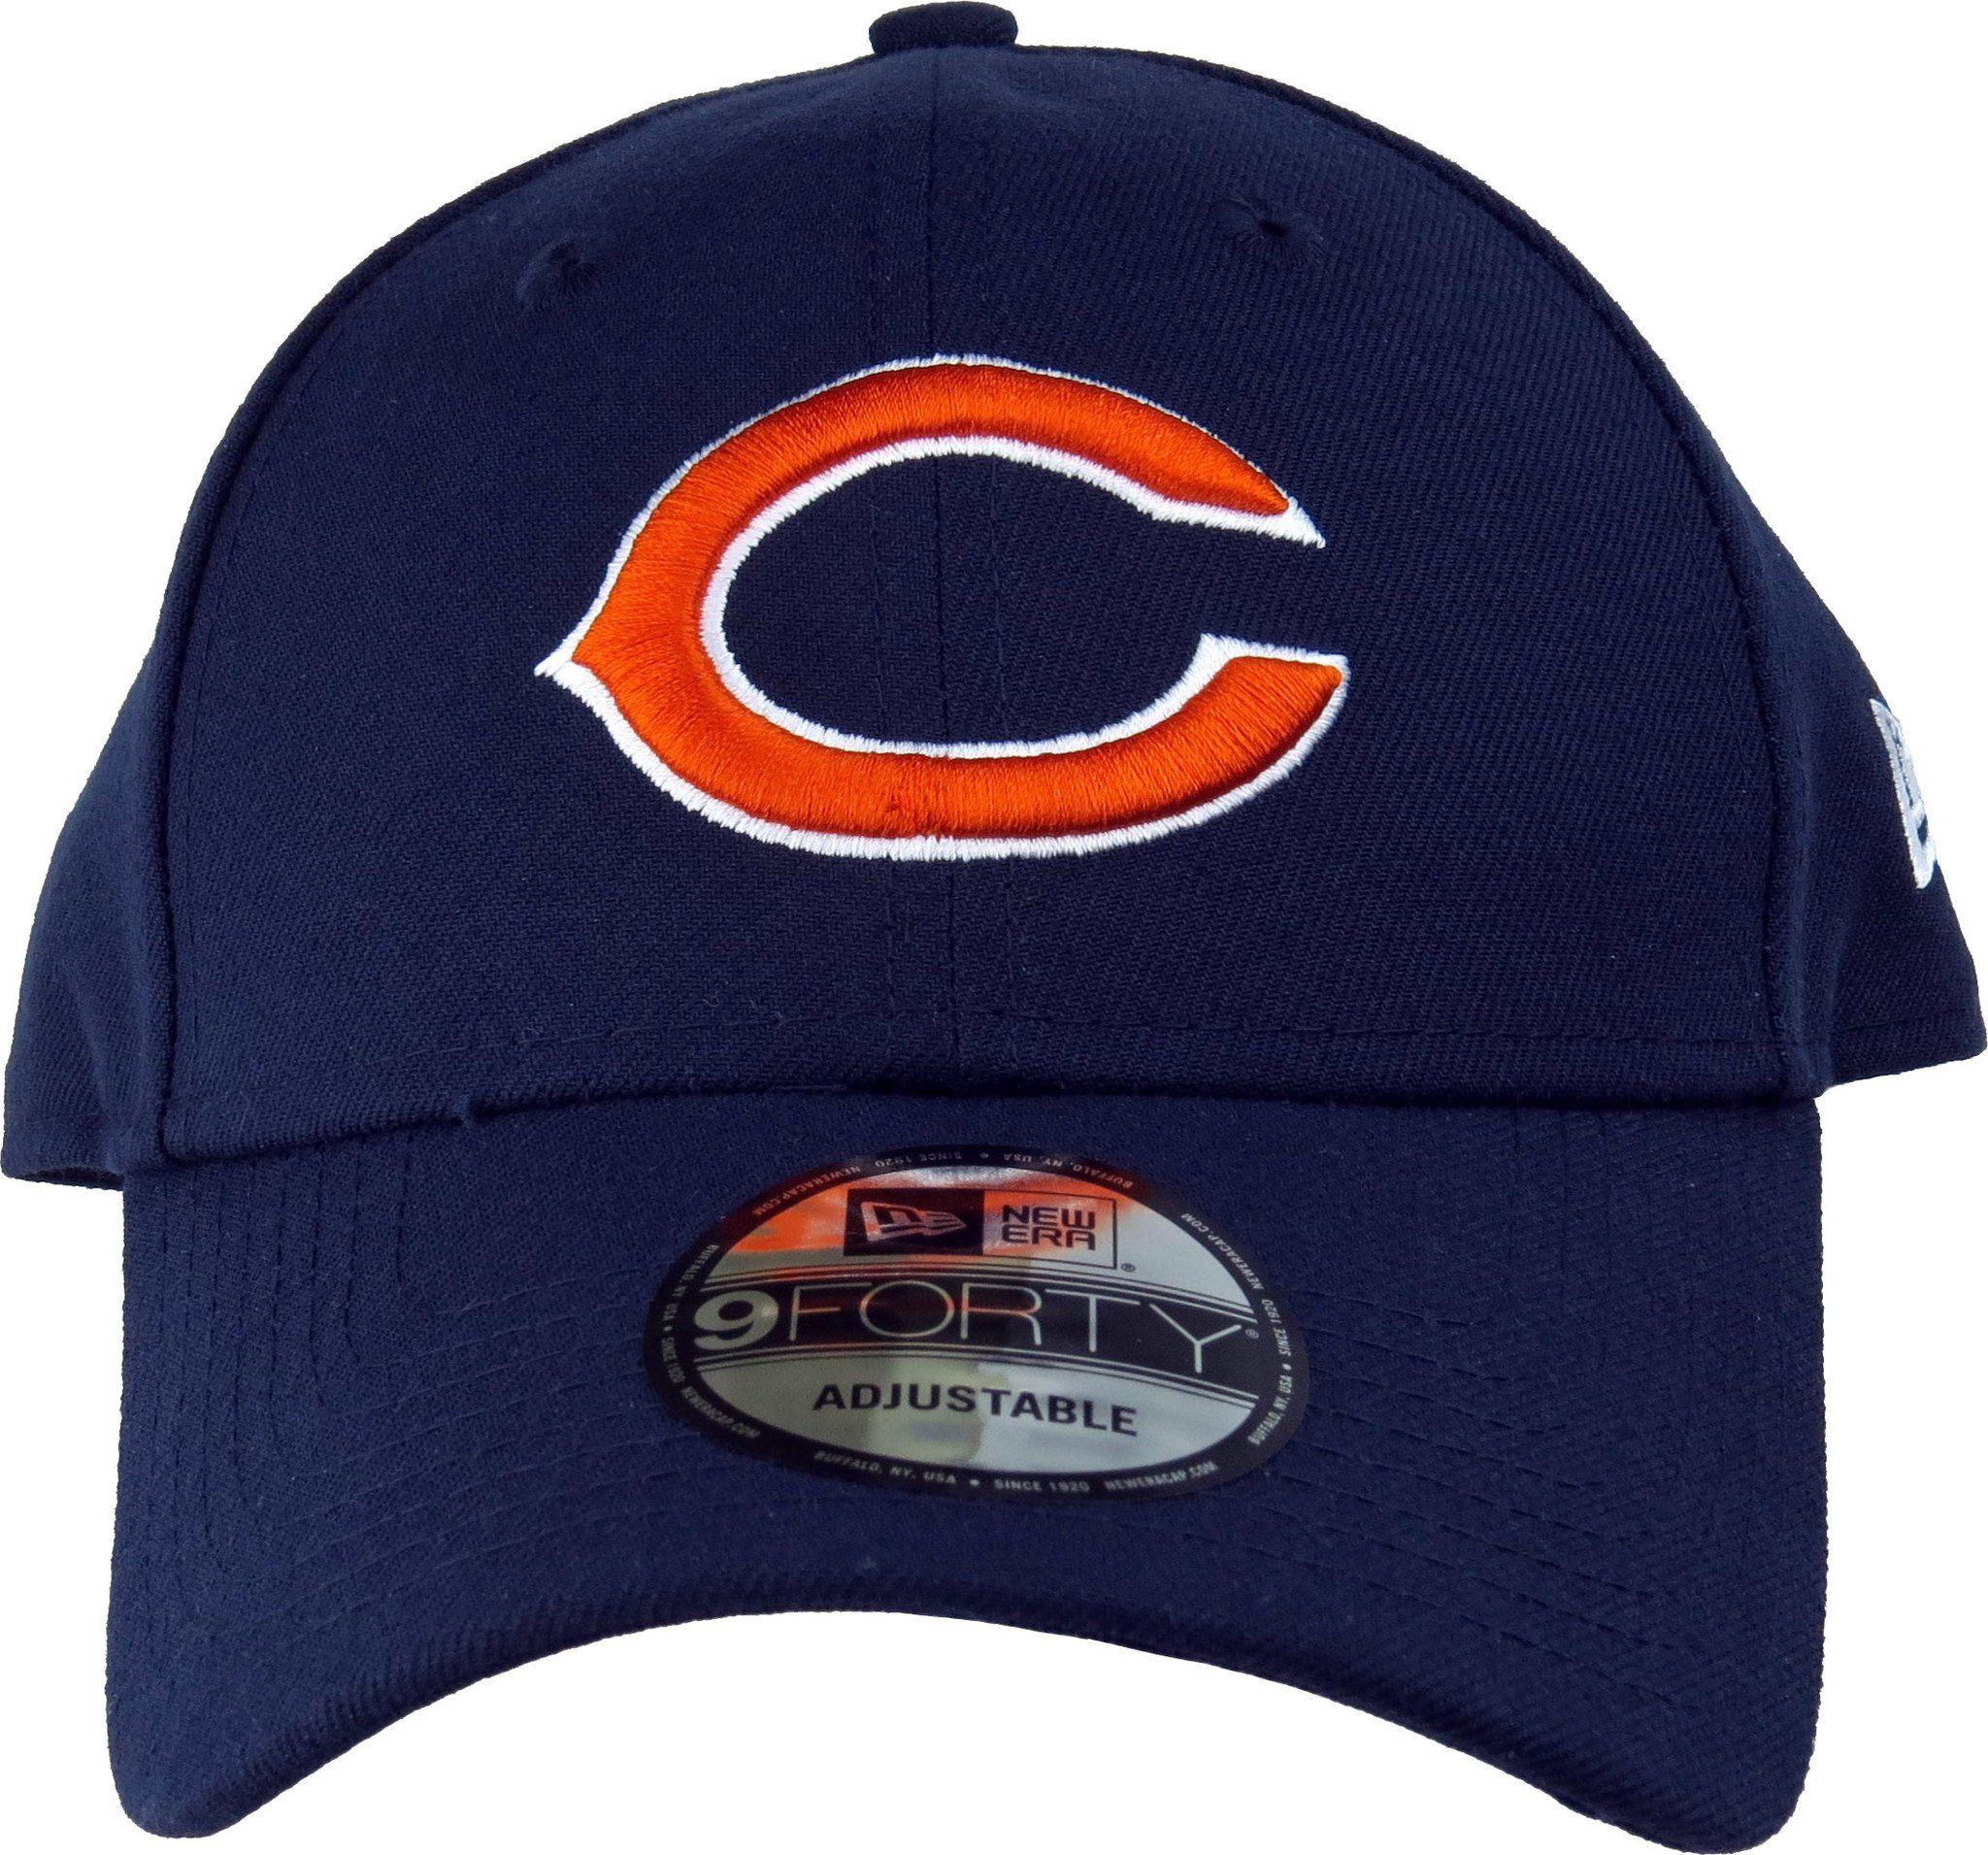 a491b120105 Chicago Bears New Era 940 The League NFL Adjustable Cap